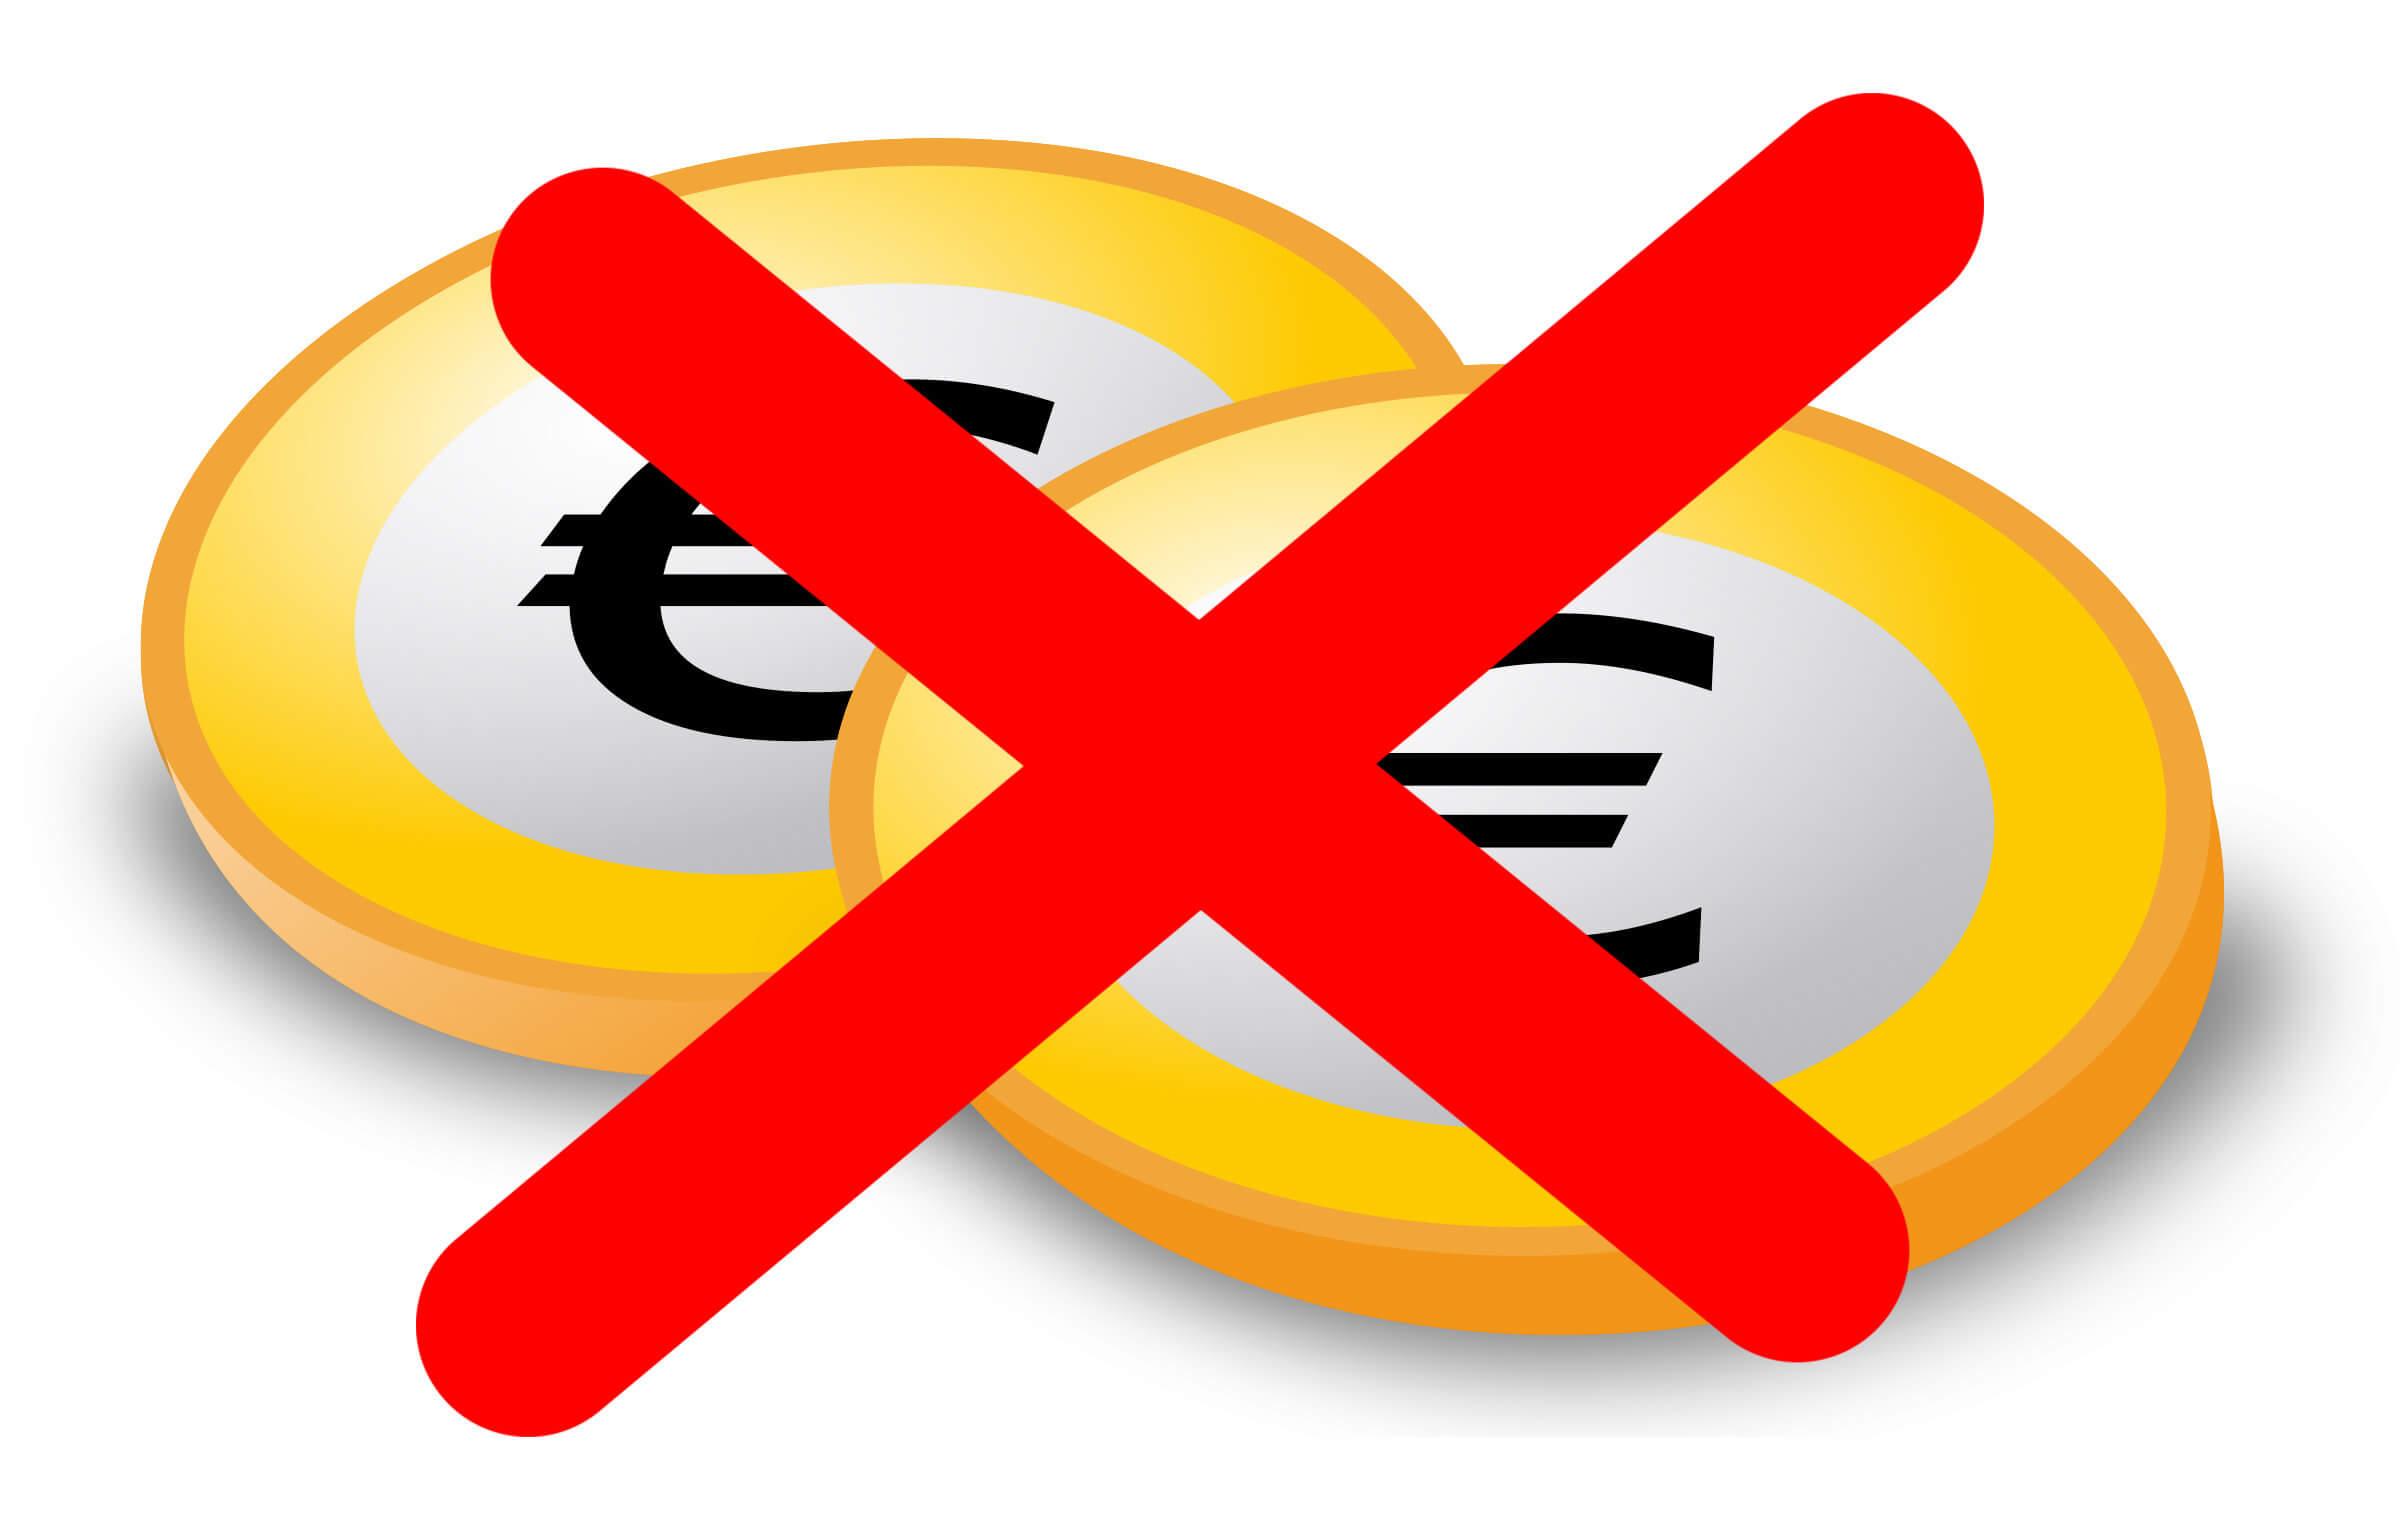 Abschaffung des Bargelds schon bald?